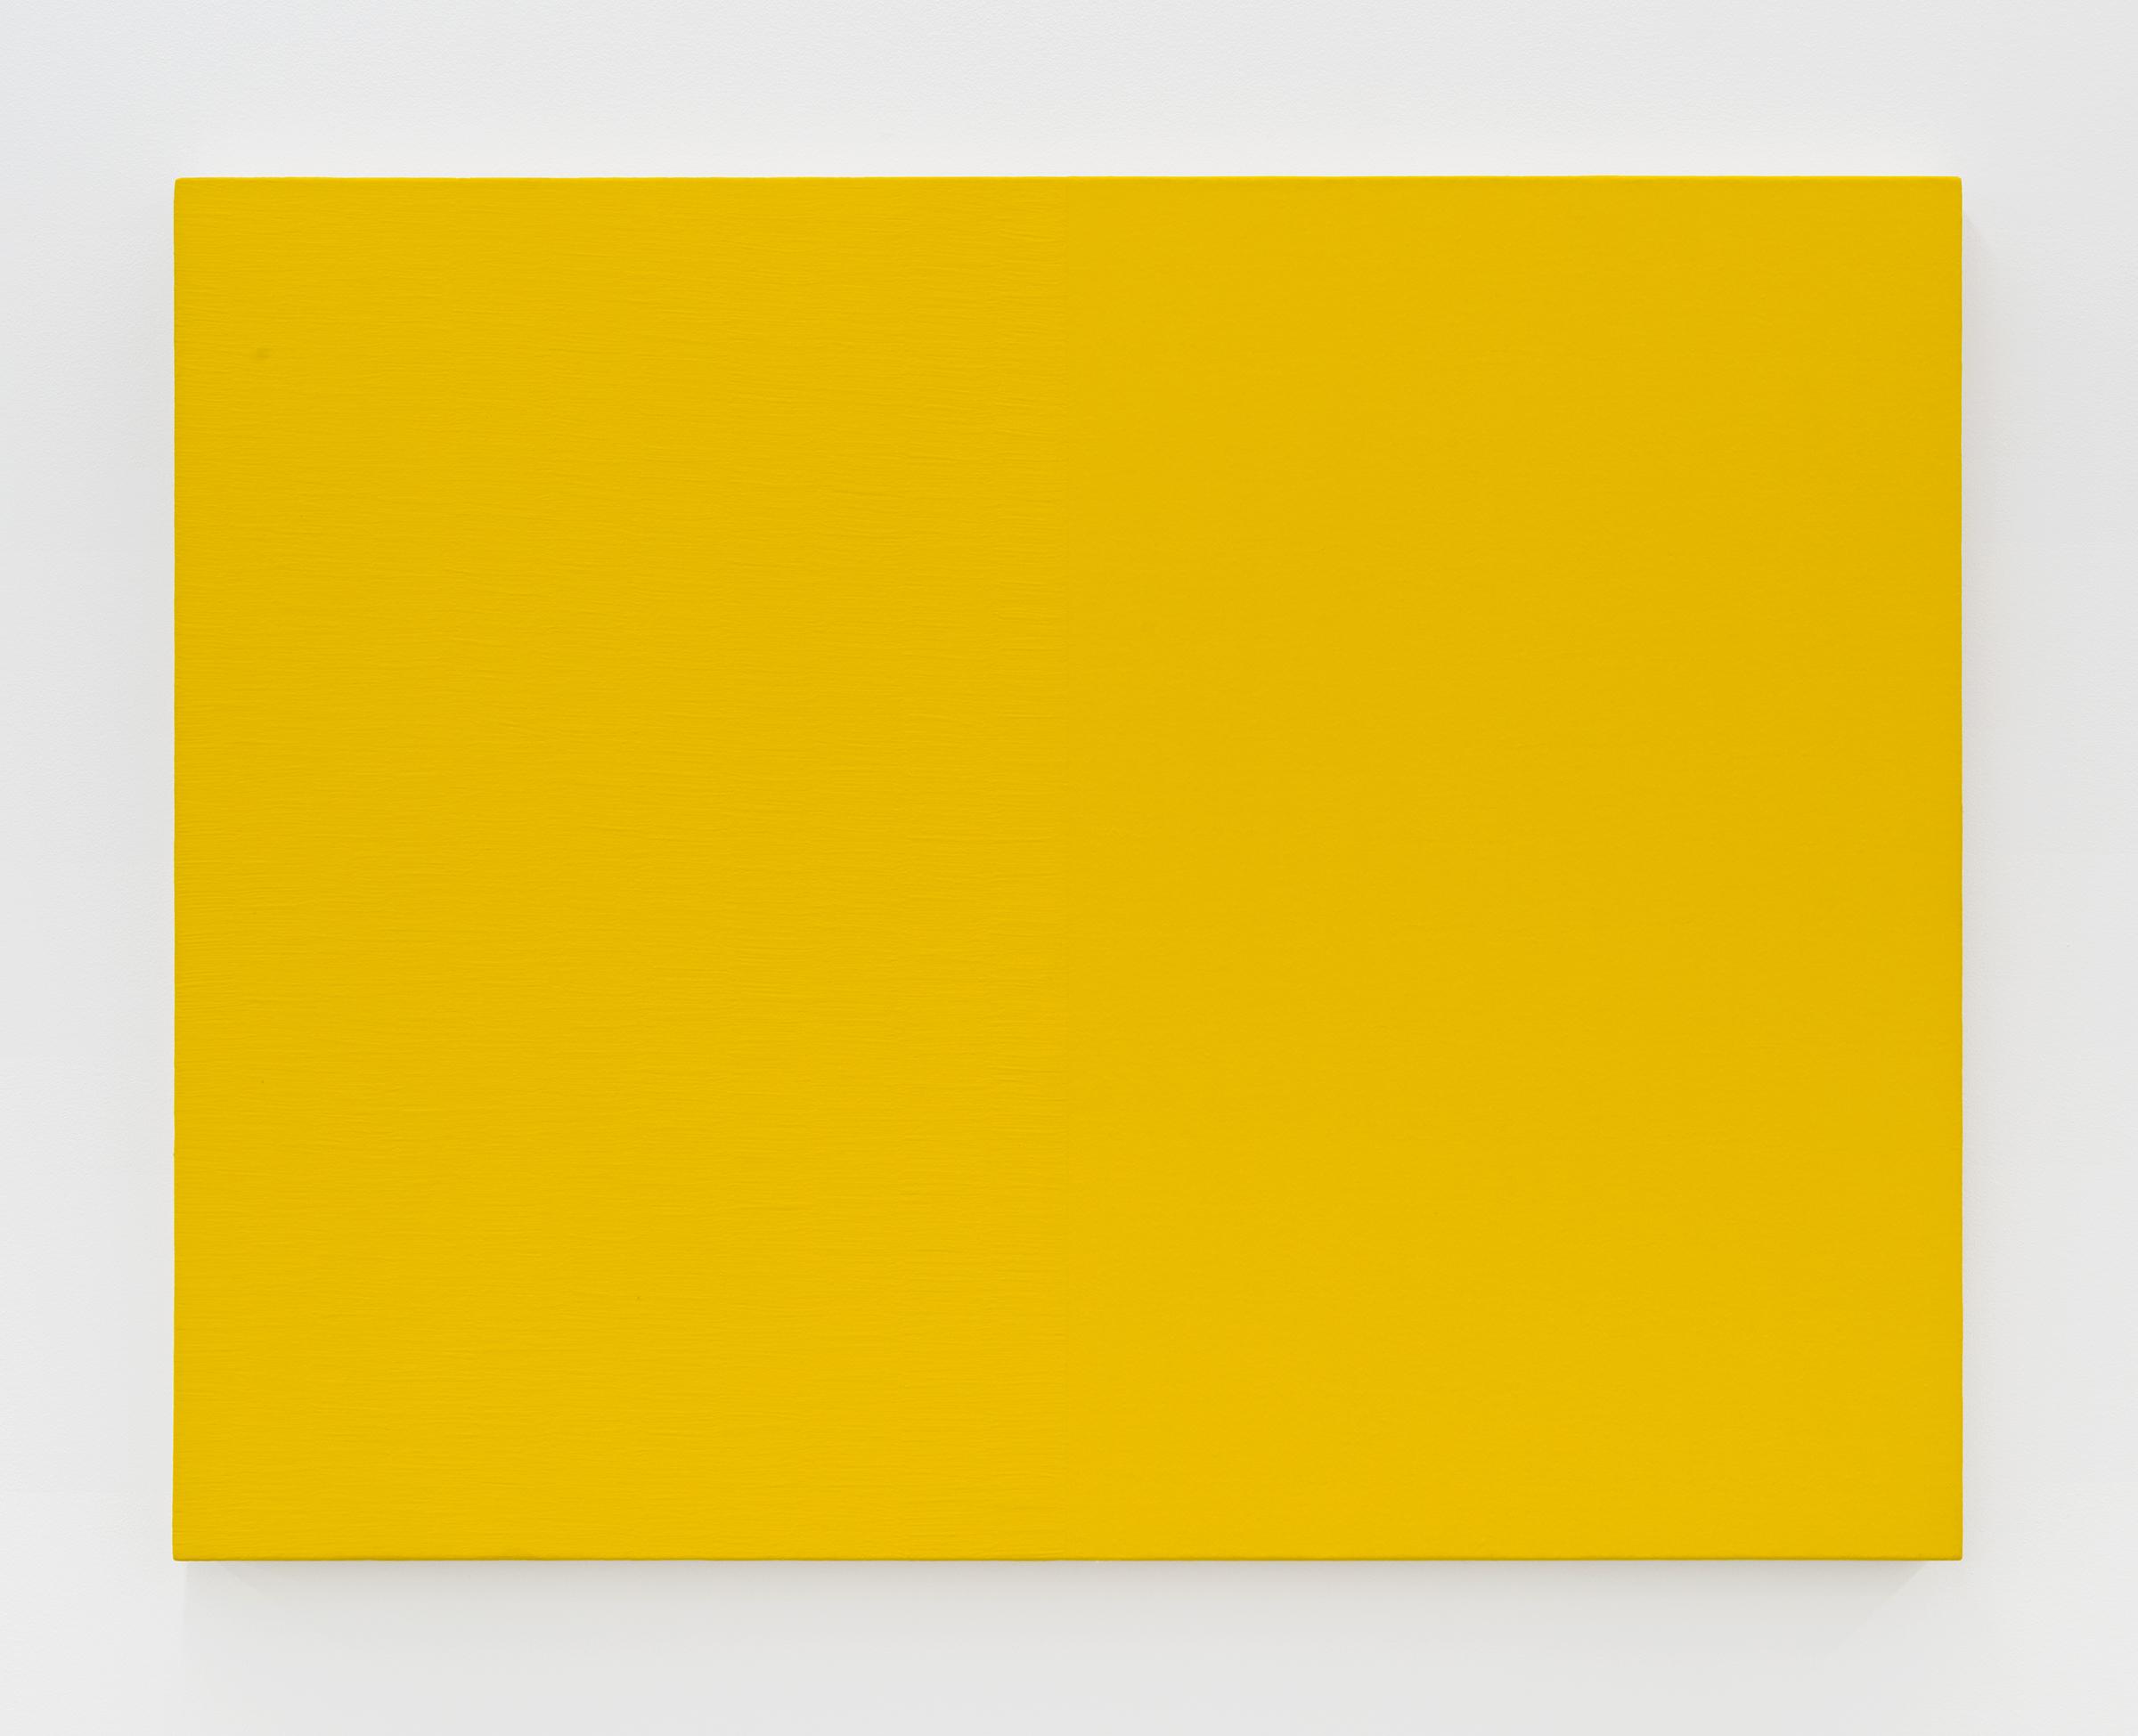 Edith Baumann  Untitled #1,  1979 acrylic on canvas 36 x 46 - 3/4 inches